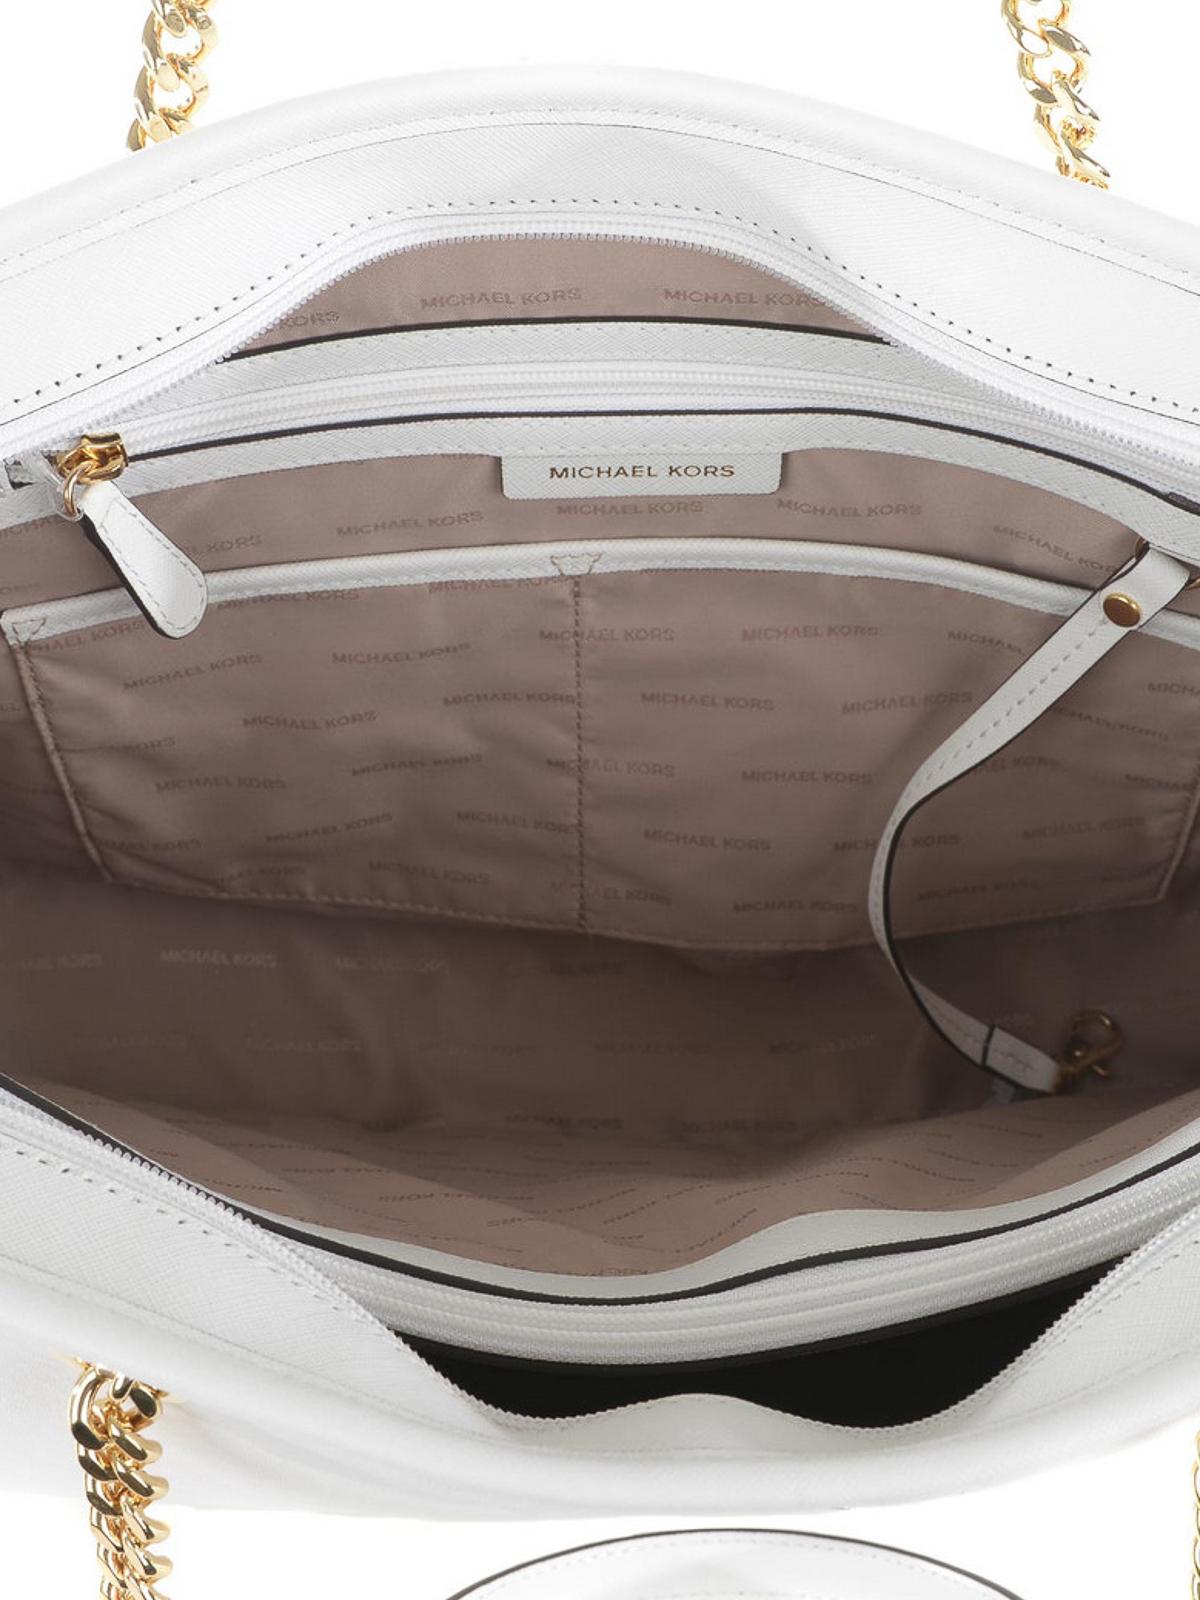 36a63abd48a4 Michael Kors - Jet Set Travel Chain medium tote - totes bags ...